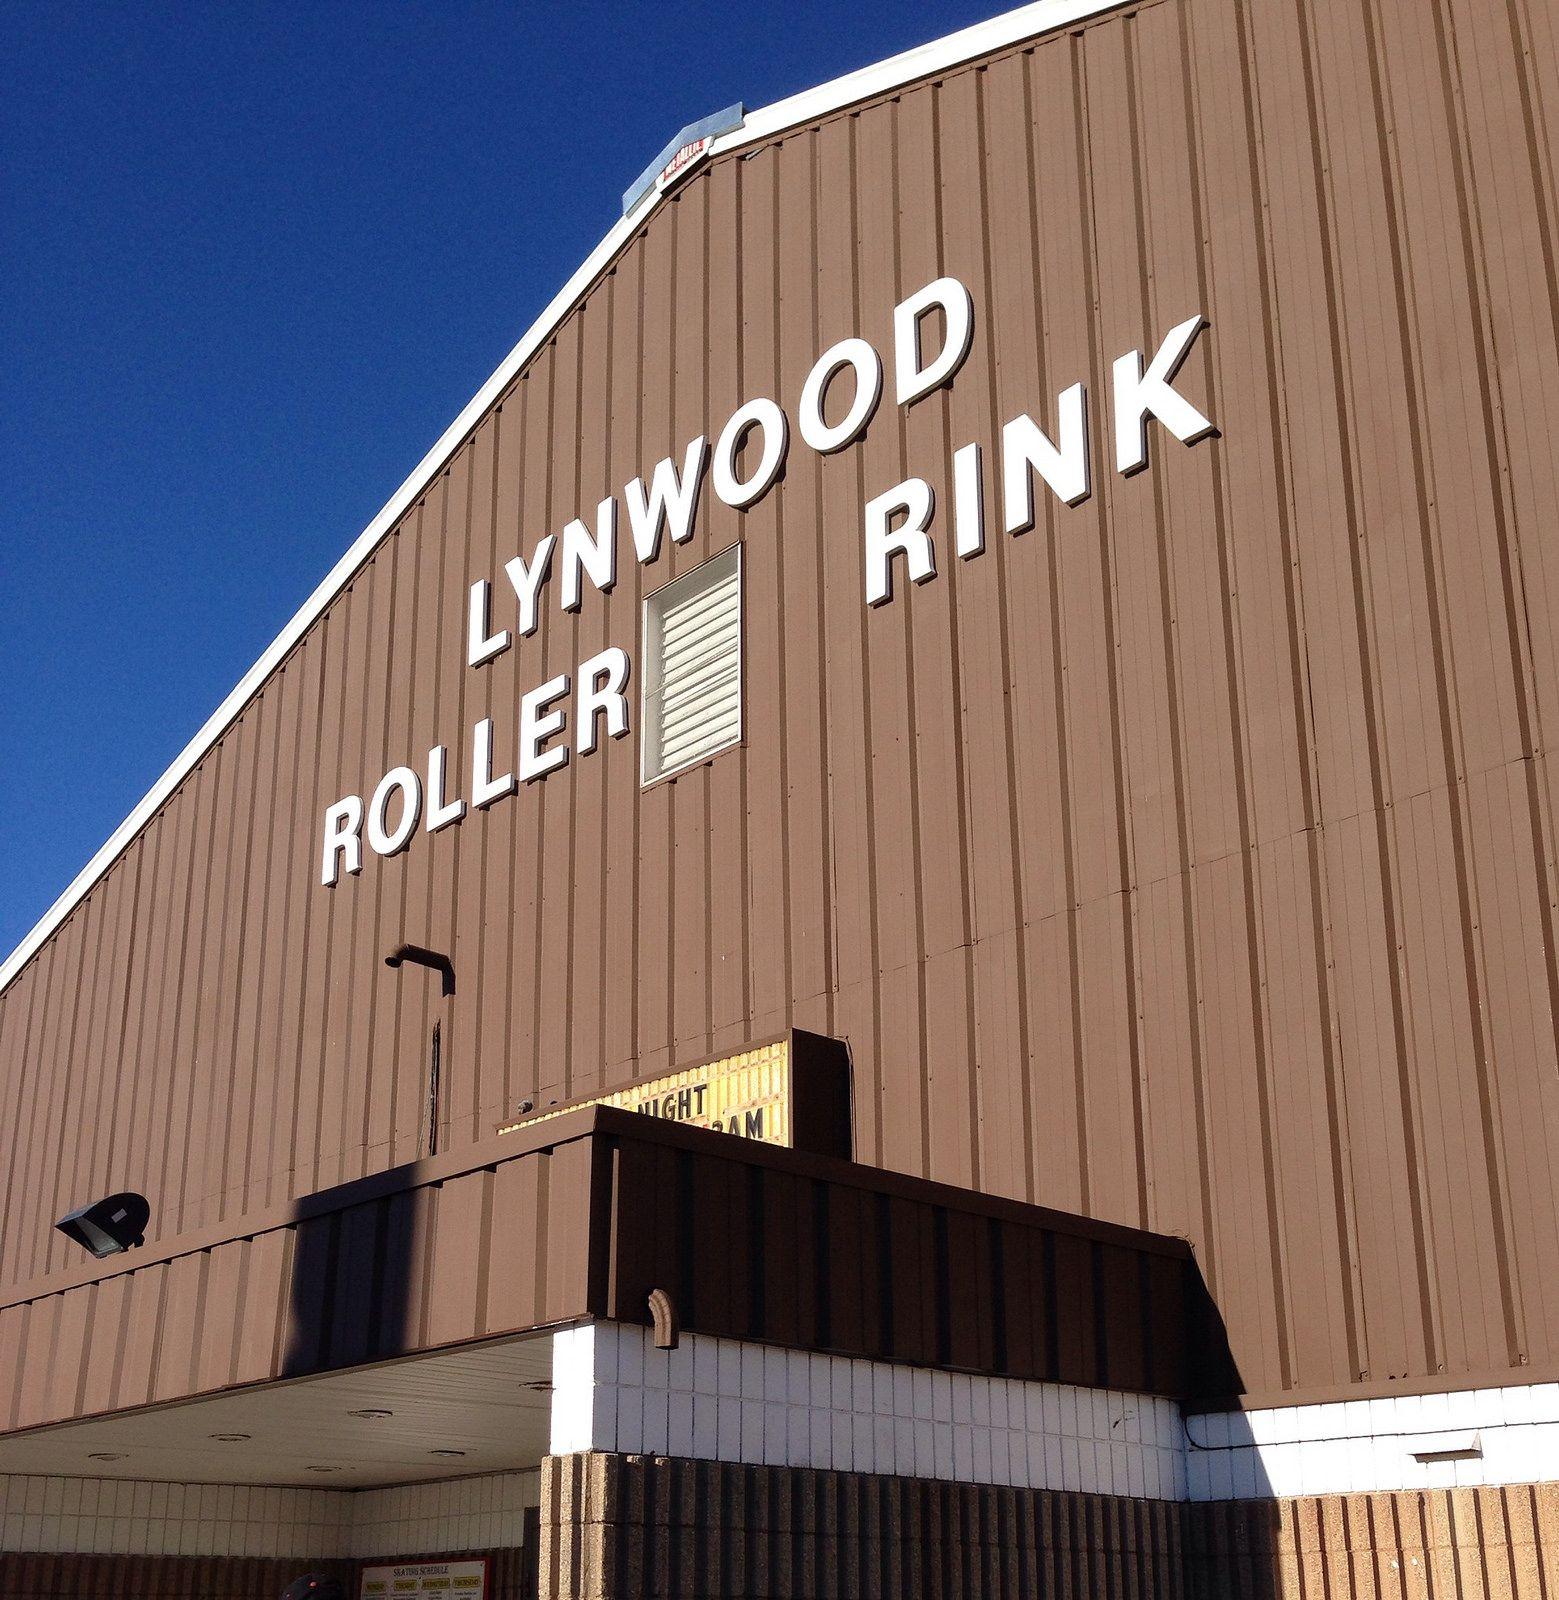 Lynwood Skating Rink